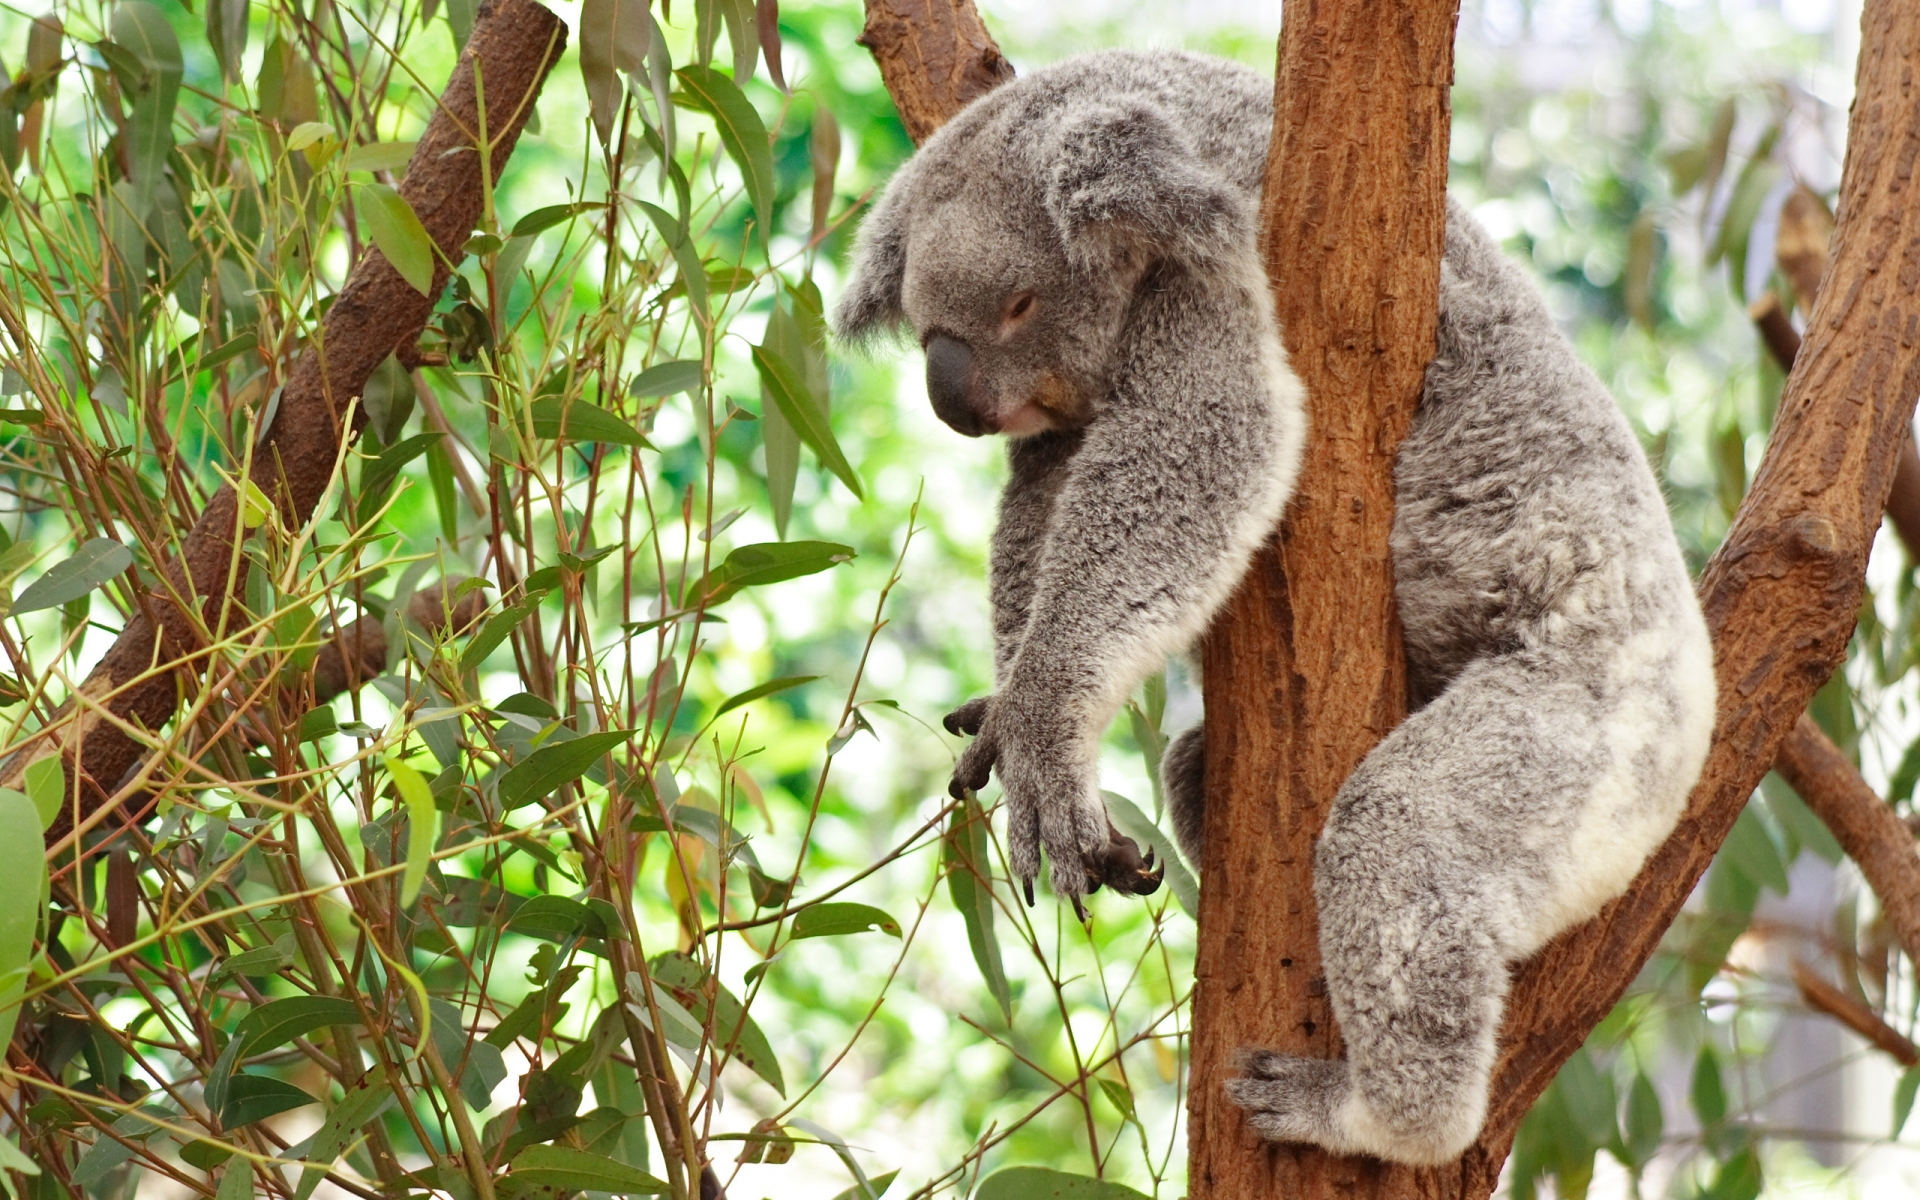 Koala Baby Wallpaper images